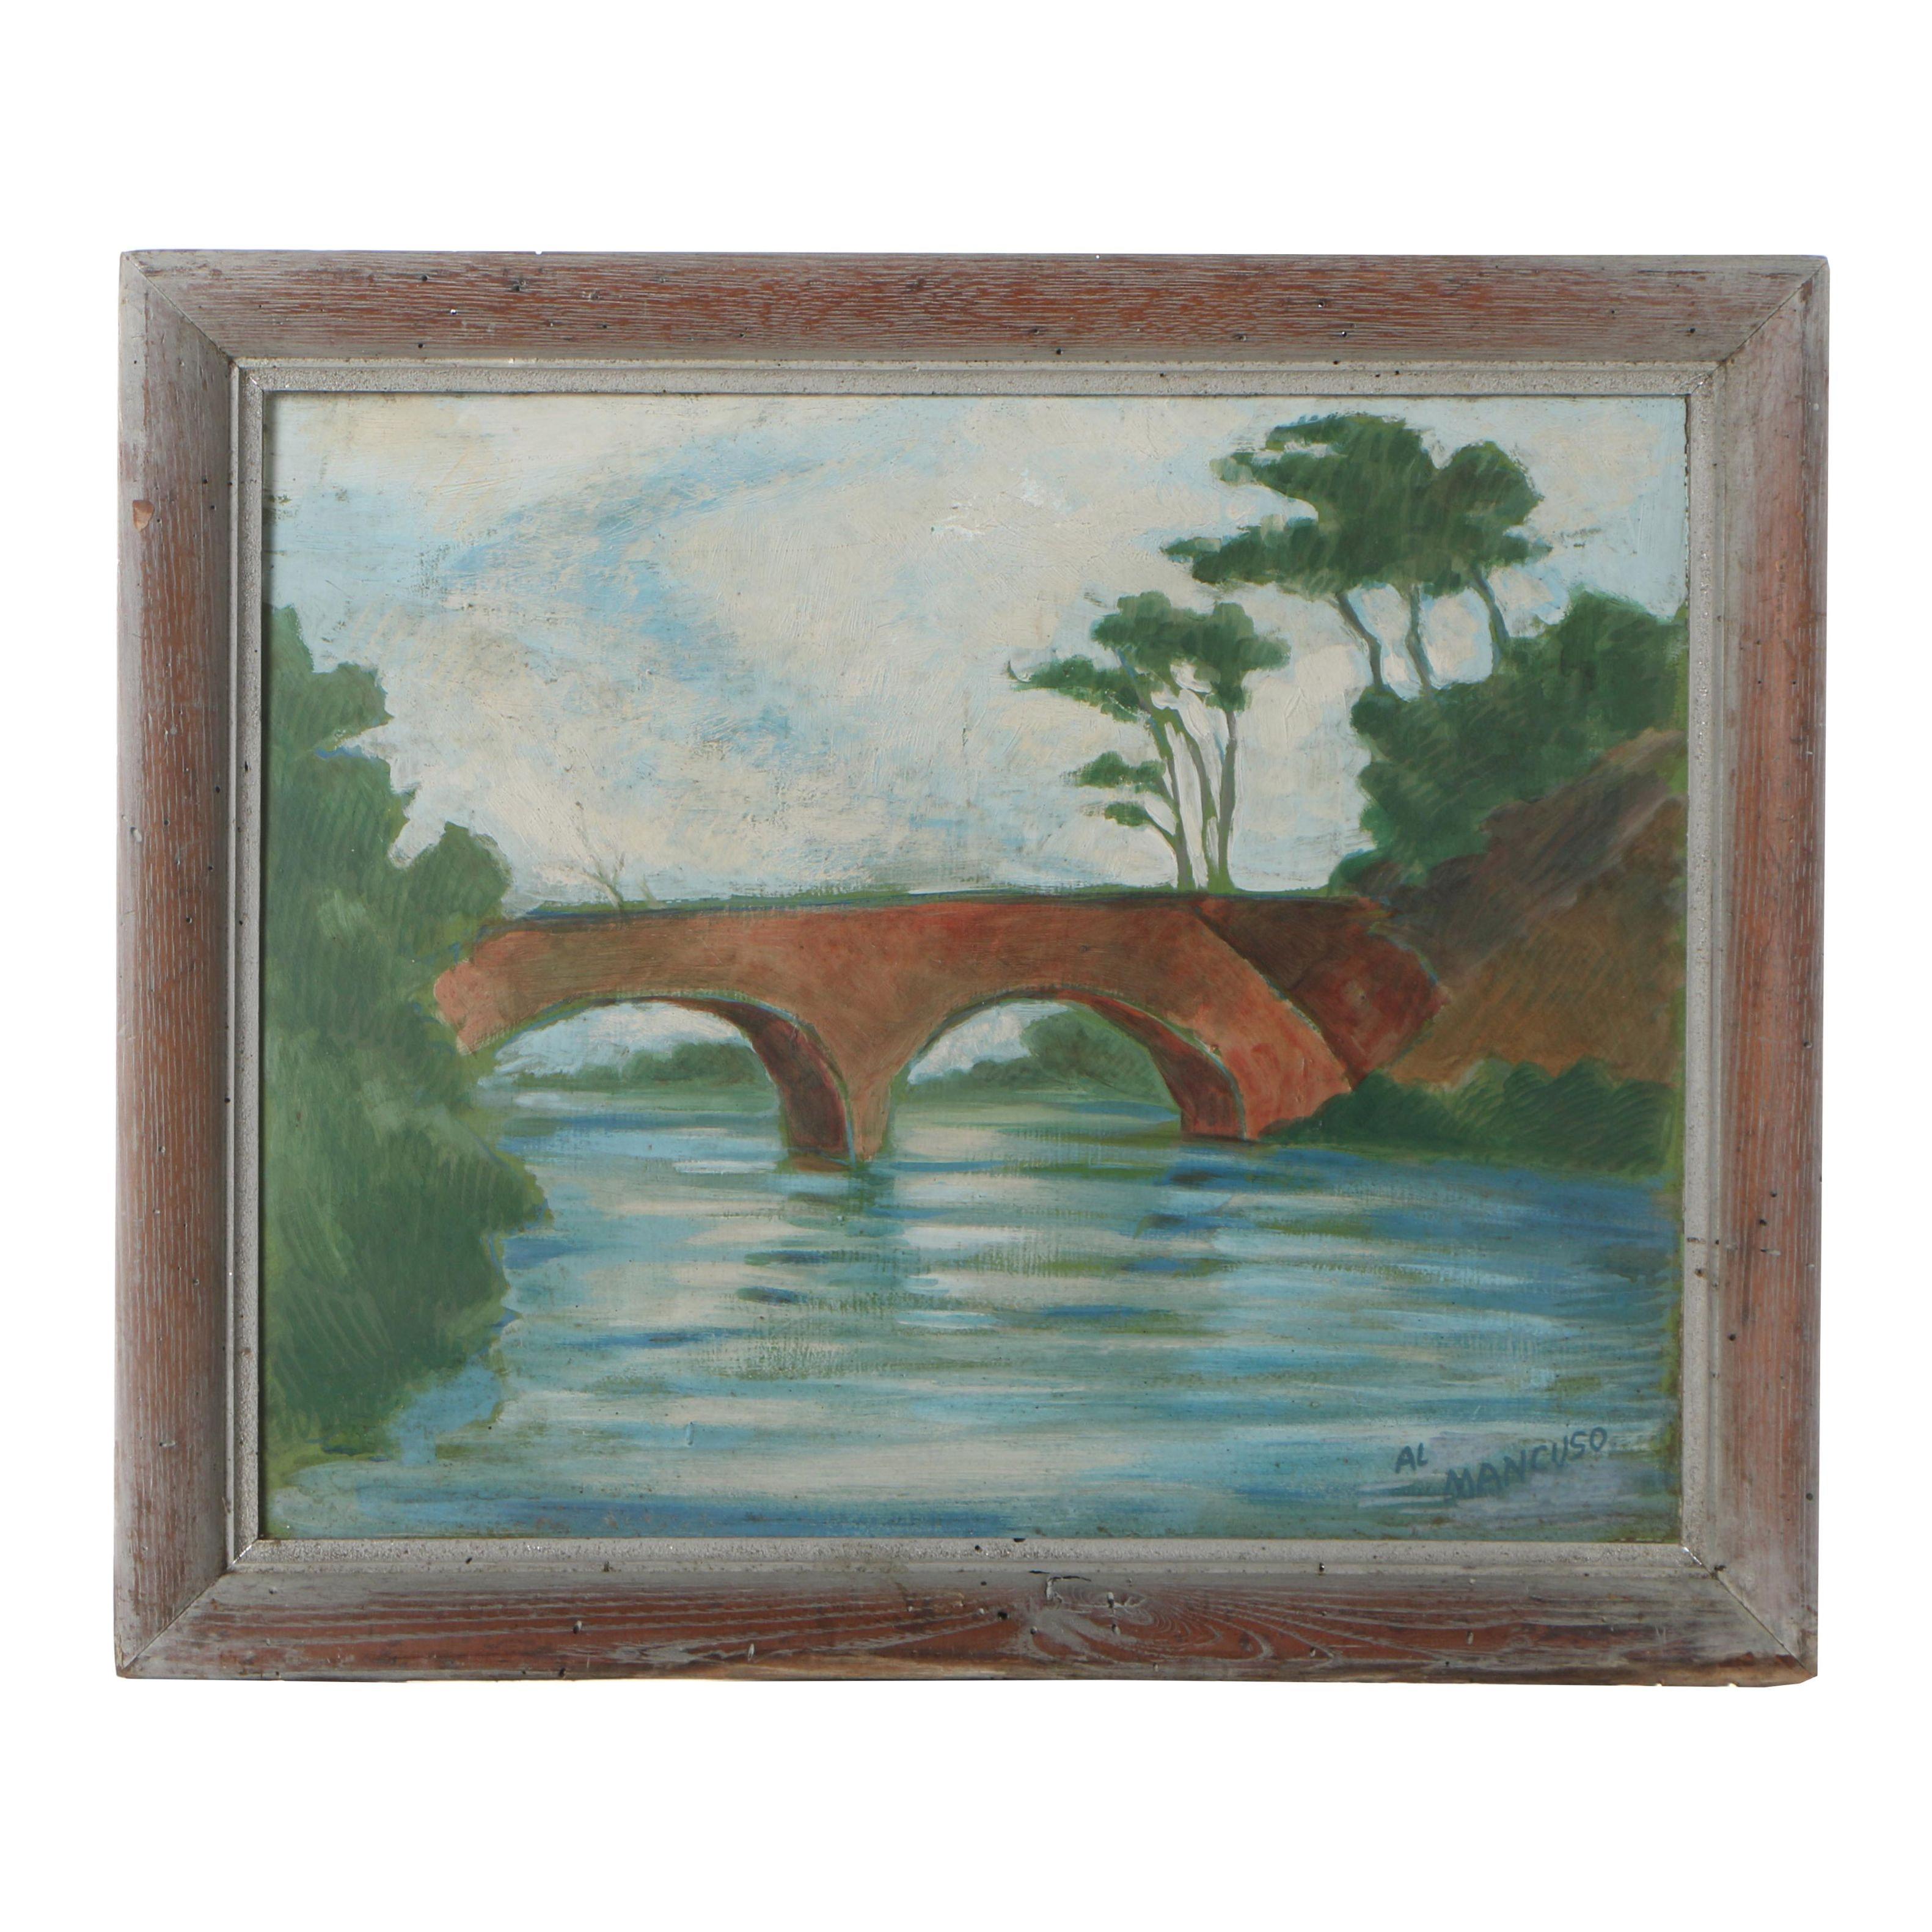 Al Mancuso Scenic Oil Painting